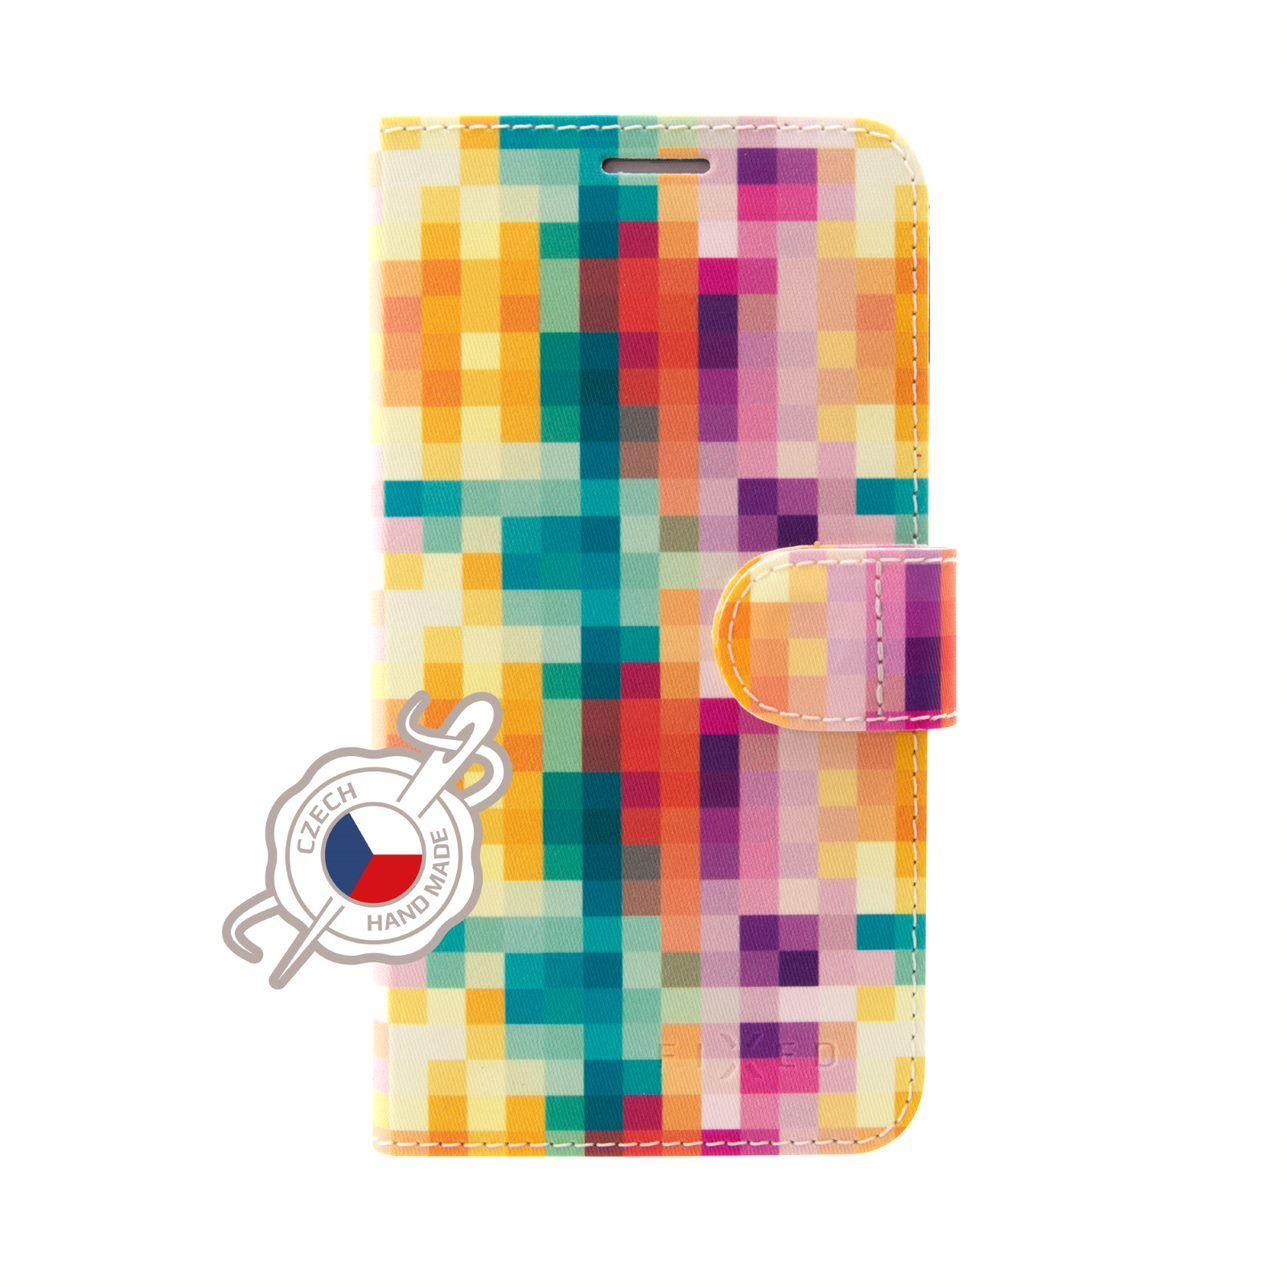 FIXED FIT flipové pouzdro pro Huawei P Smart 2019, motiv Dice